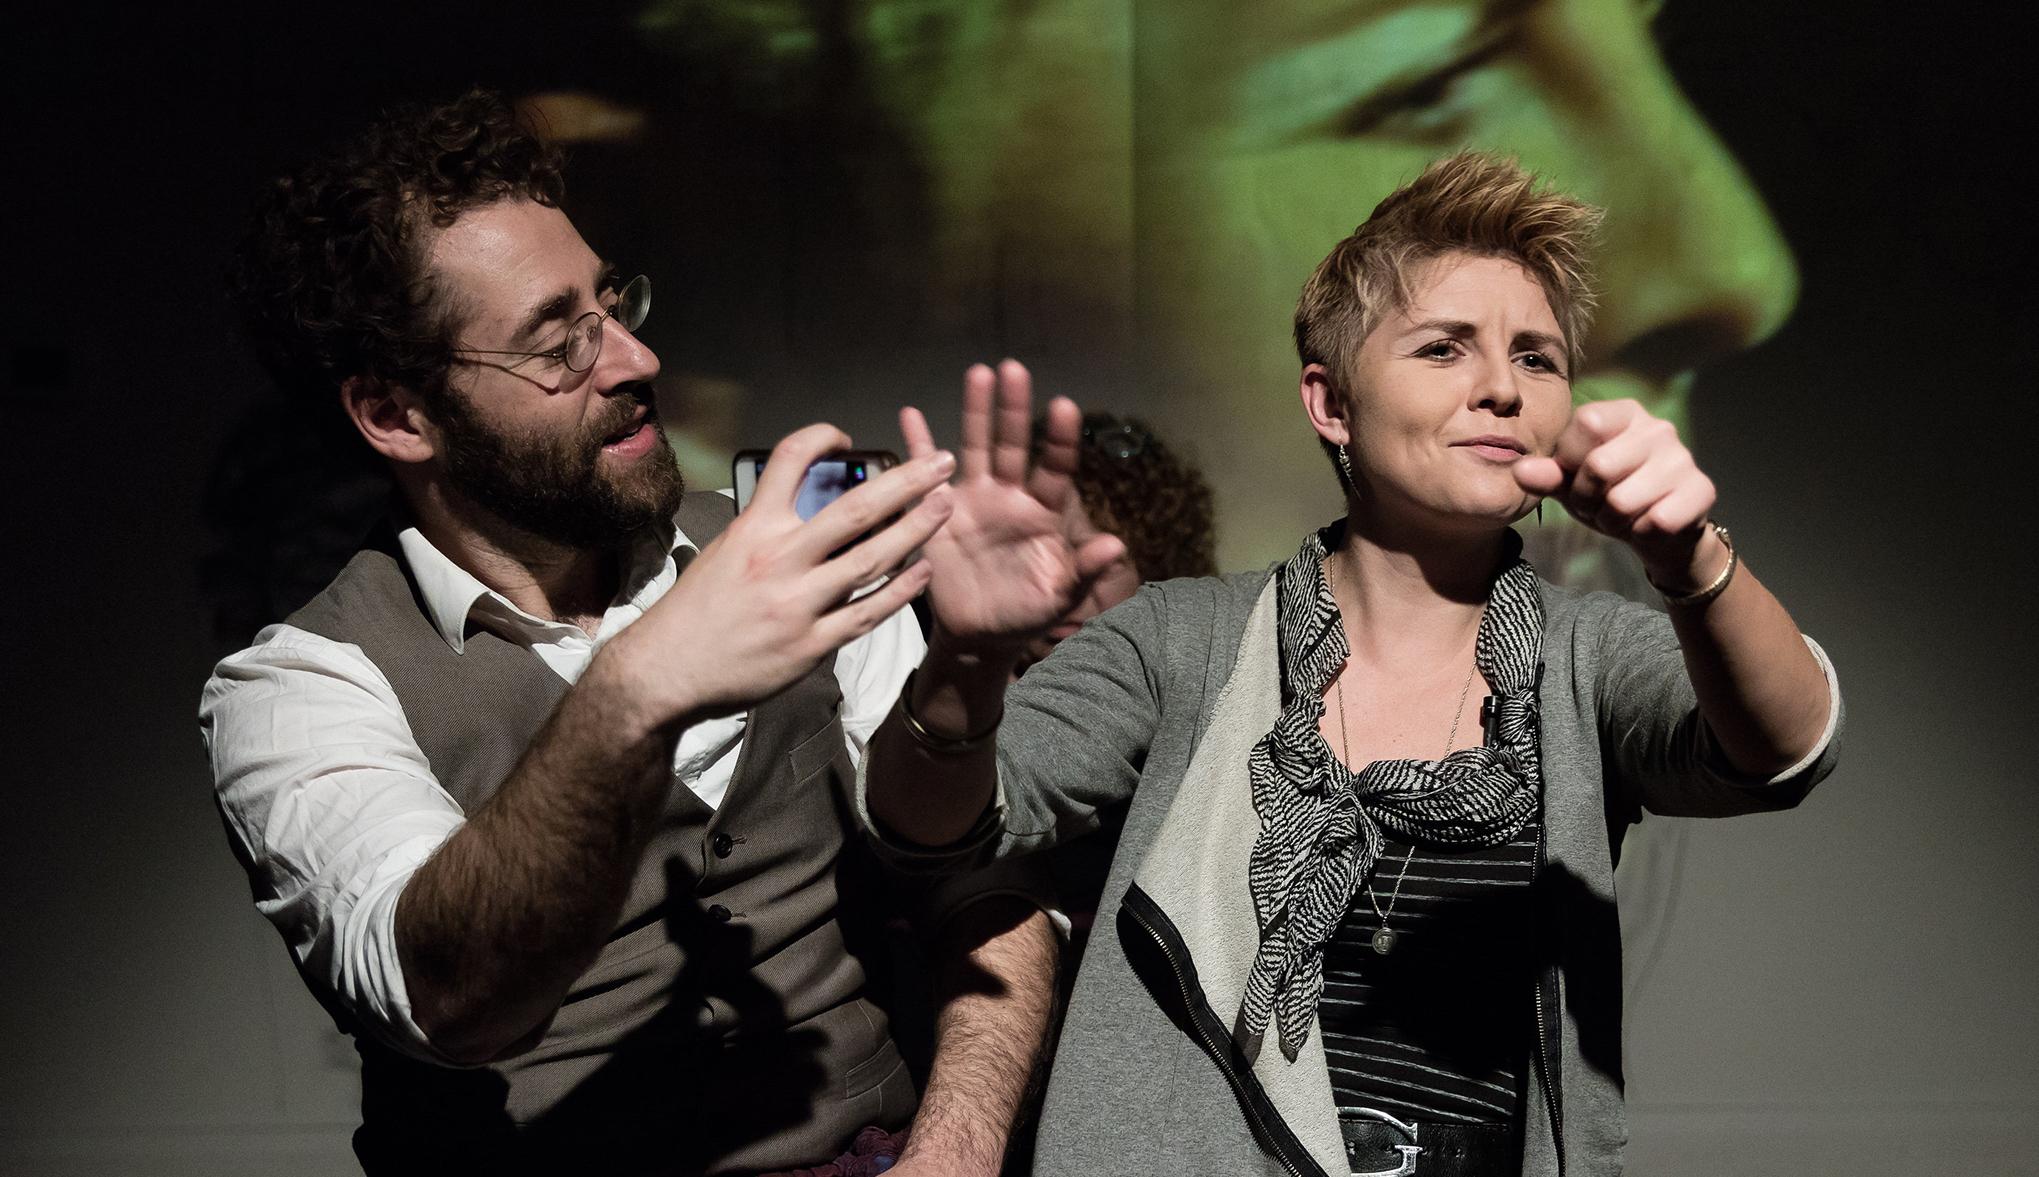 18th ANNUAL CHUTZPAH! FESTIVAL  Lisa Nemetz International Jewish Performing Arts Festival  February 15 – March 15, 2018